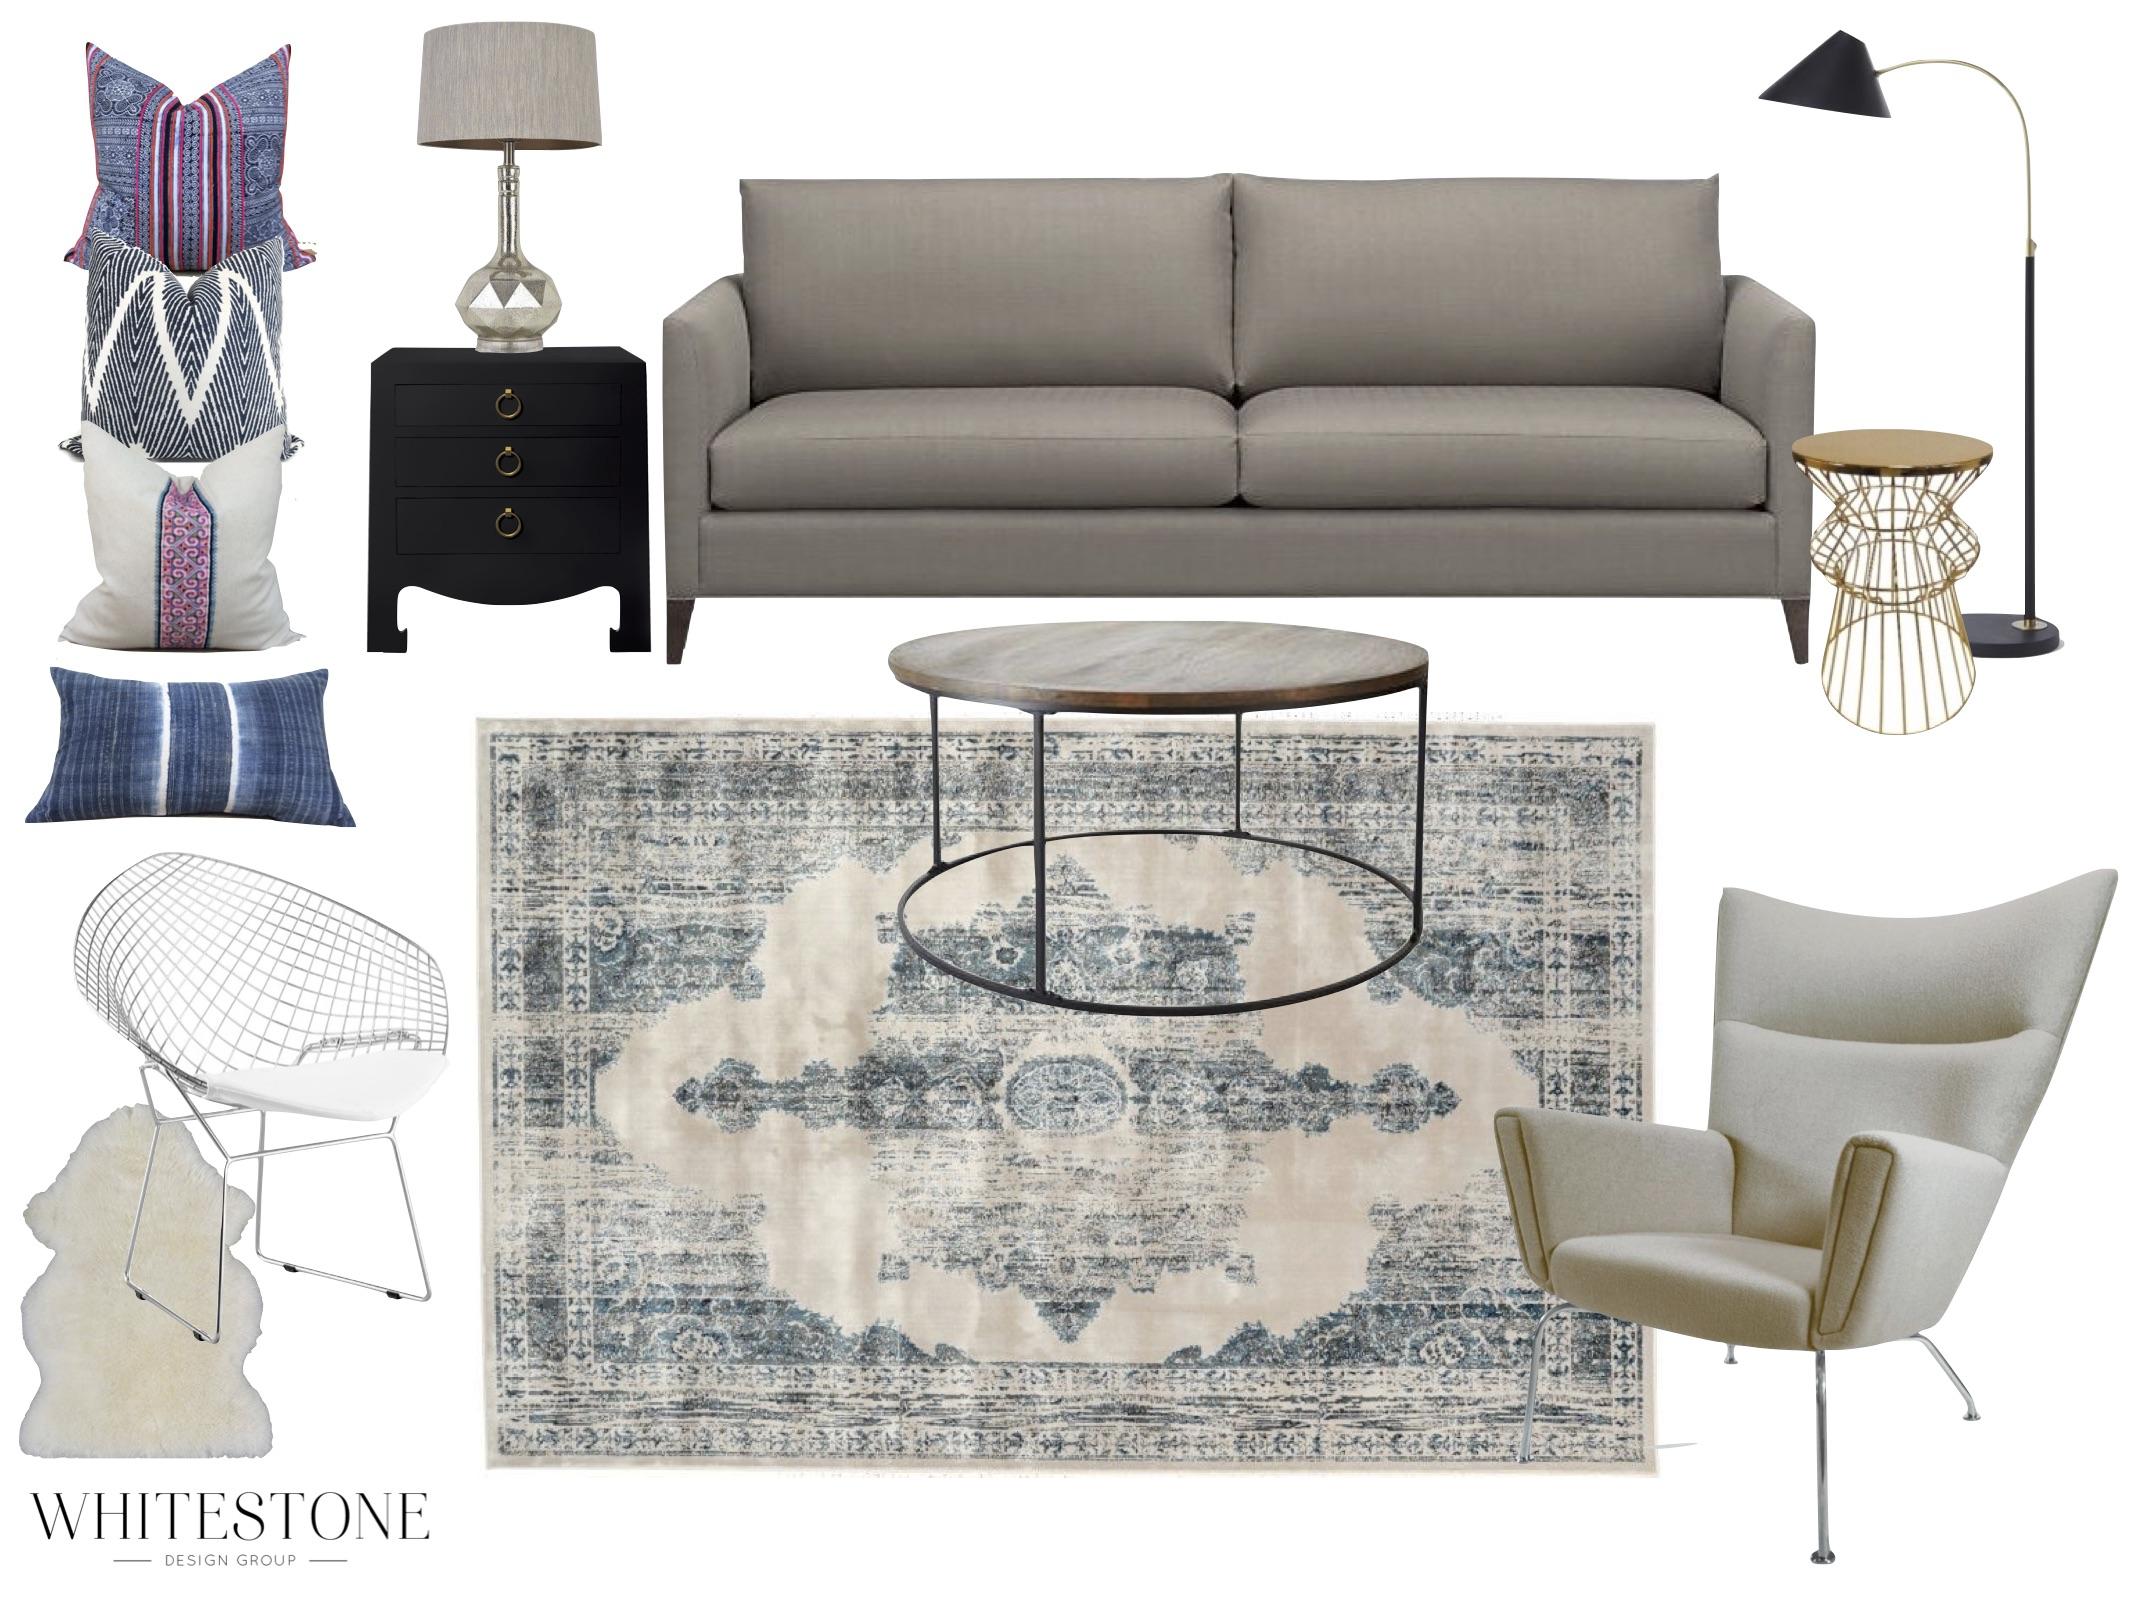 Whitestone Design Group   Design Plan   Katie's House   Interior Design   Seattle, WA